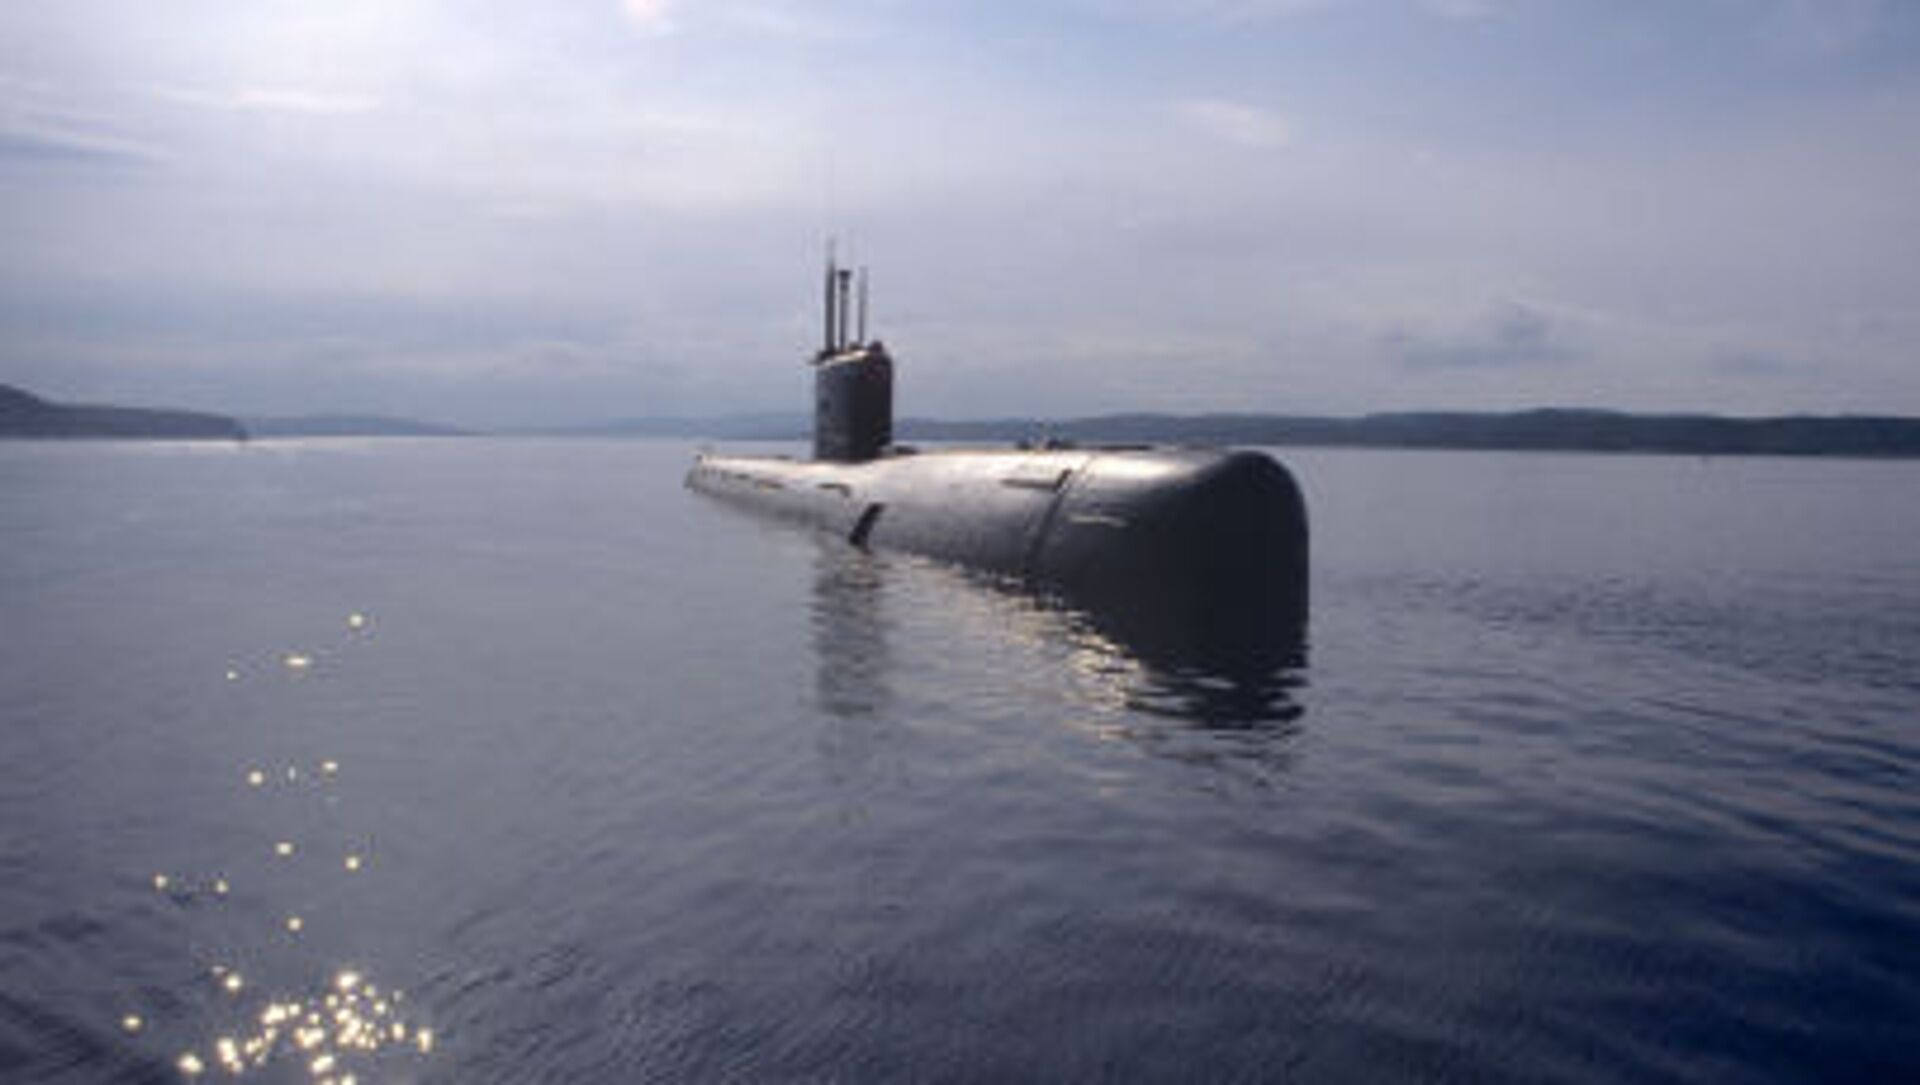 tàu ngầm Varshavyanka của Nga - Sputnik Việt Nam, 1920, 28.03.2021